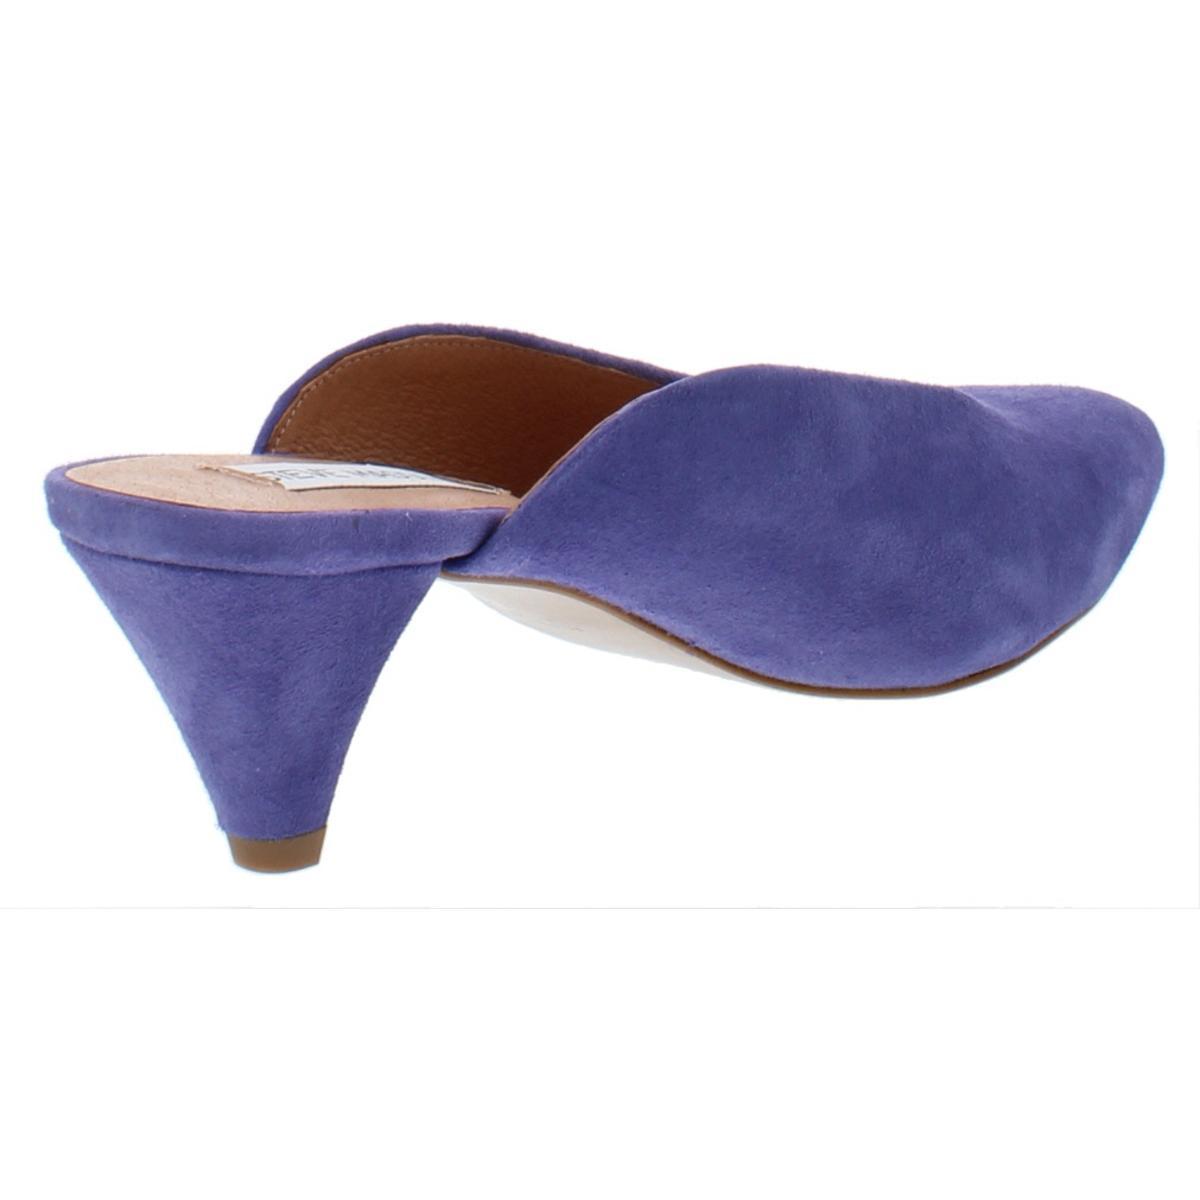 Steve-Madden-Womens-Fiesta-Leather-Pointed-Toe-Dress-Mules-Heels-BHFO-0632 thumbnail 6